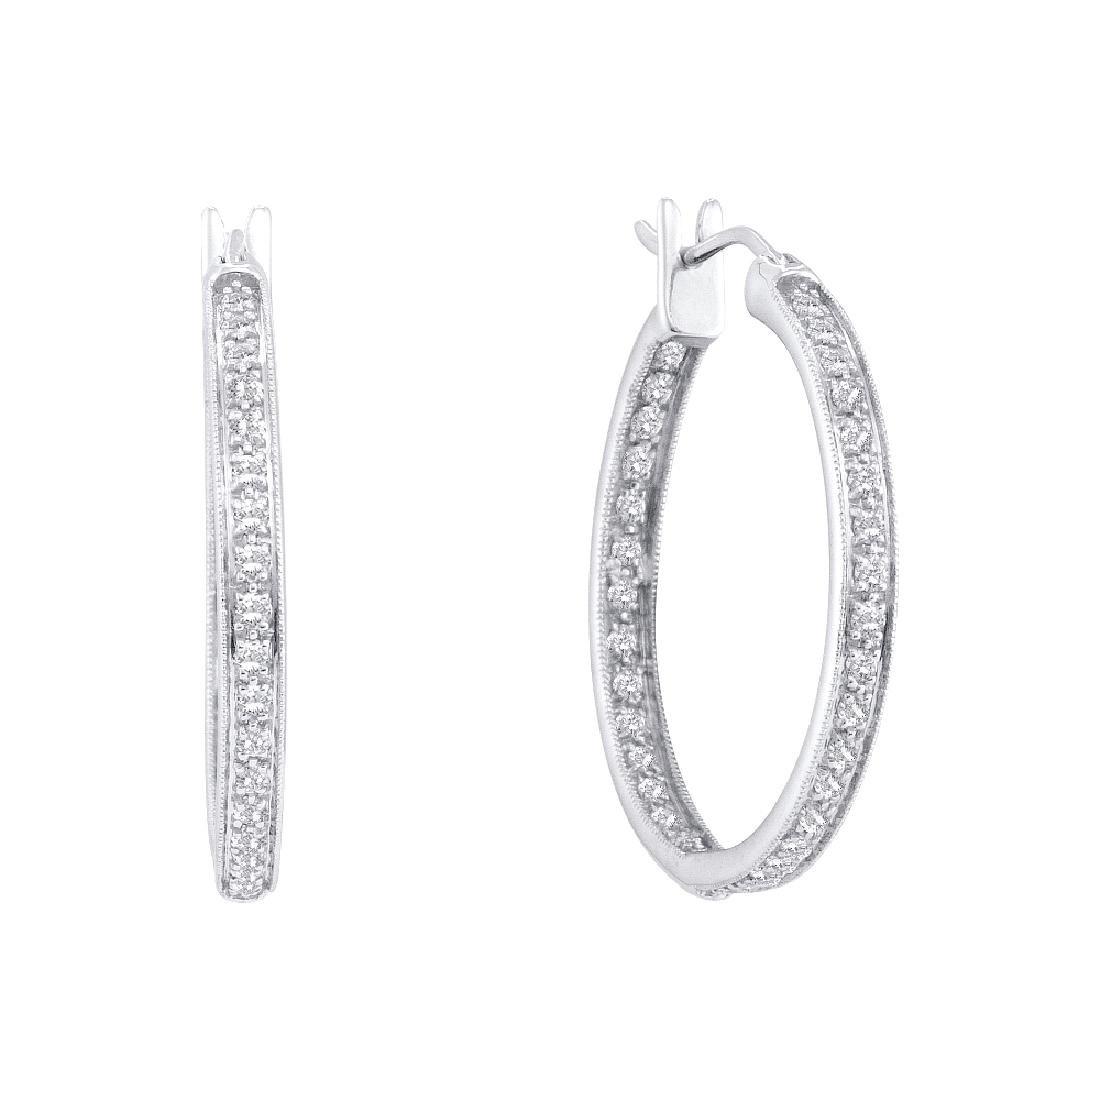 0.25 CTW Diamond In/Out Hoop Earrings 14KT White Gold -